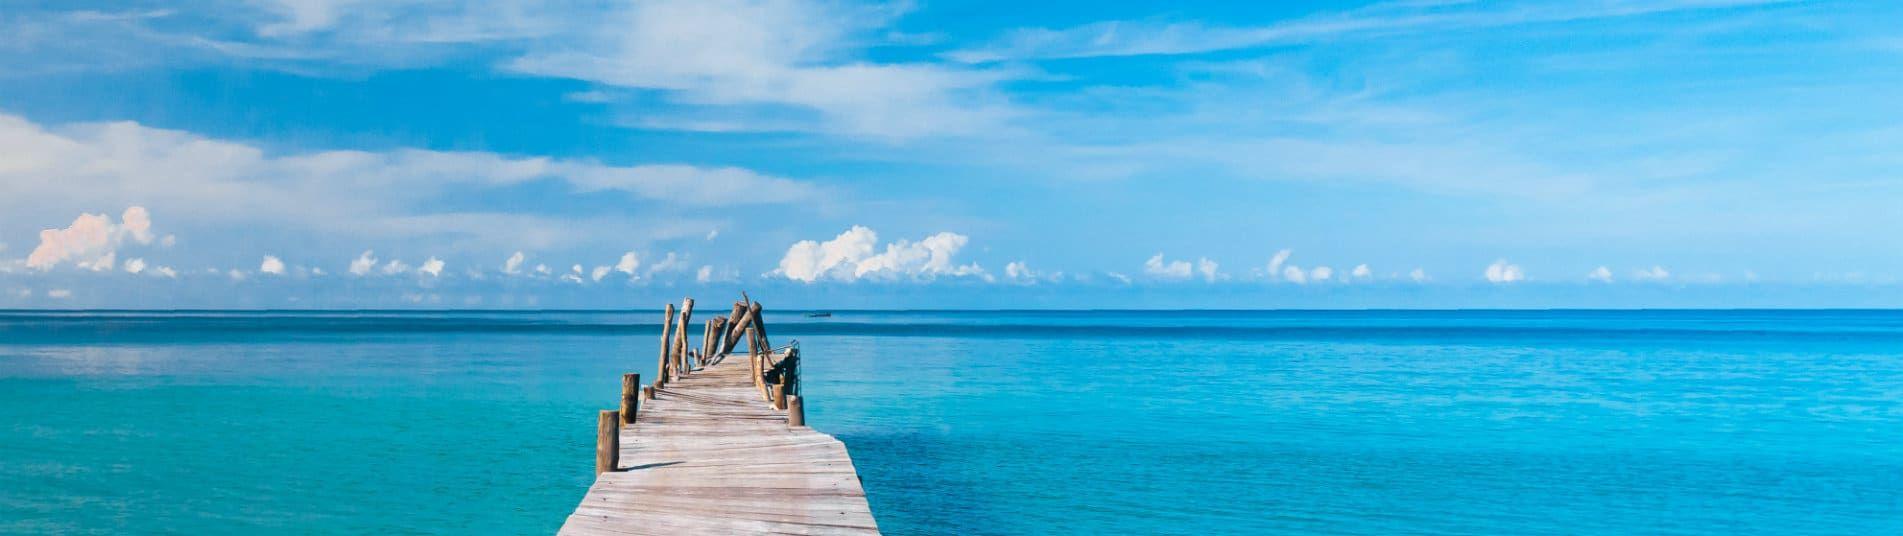 Vacances en bord de mer